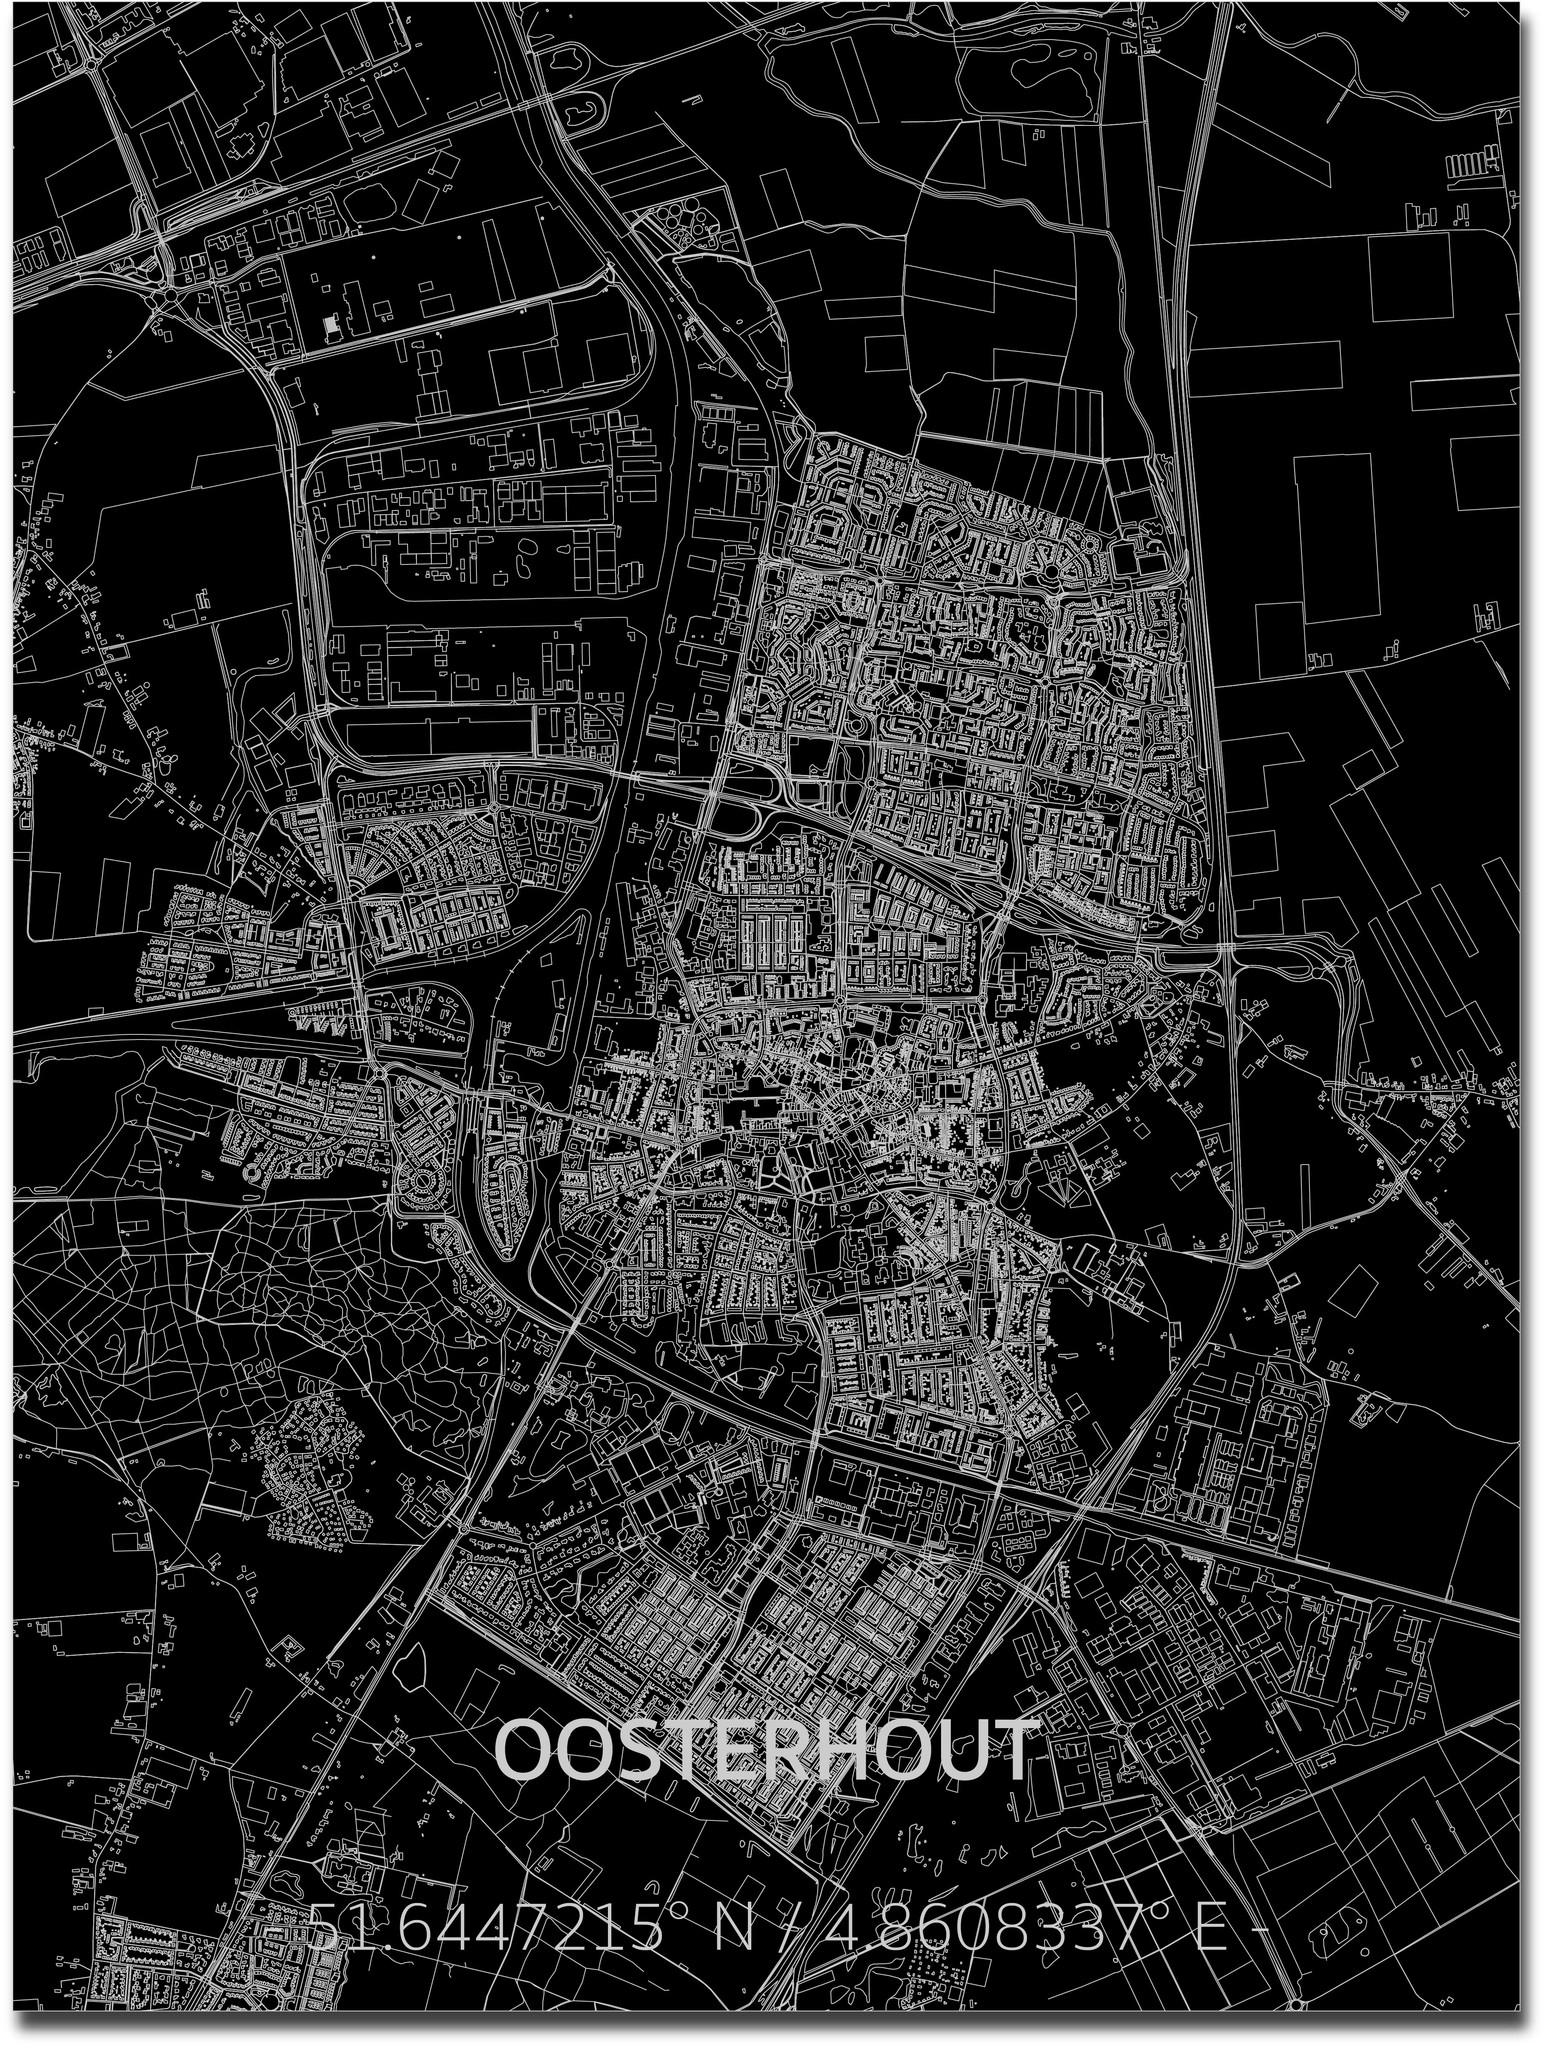 Citymap Oosterhout | Aluminum wall decoration-1